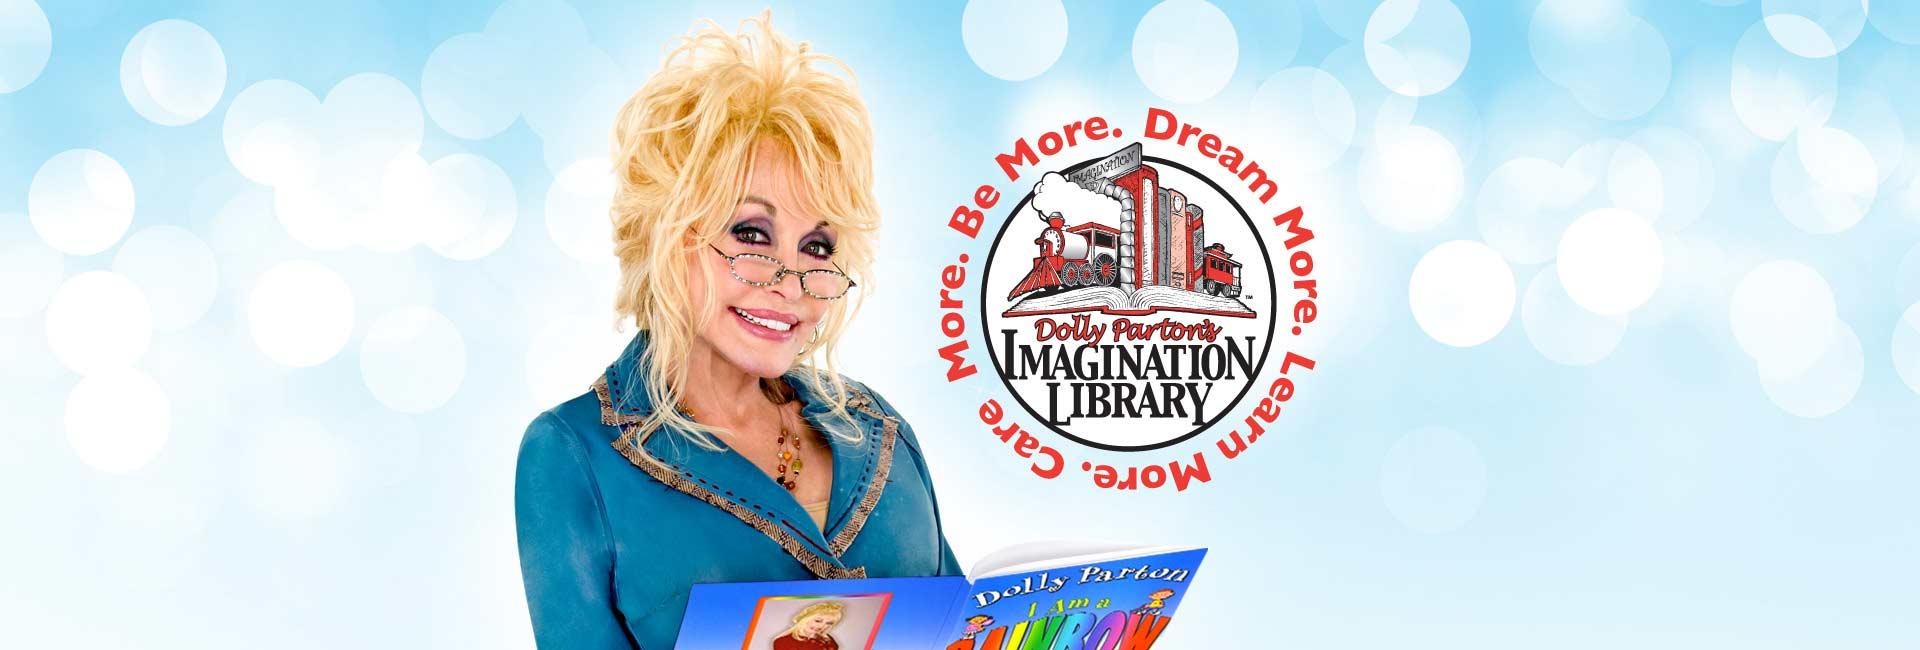 Dolly Parton S Imagination Library History